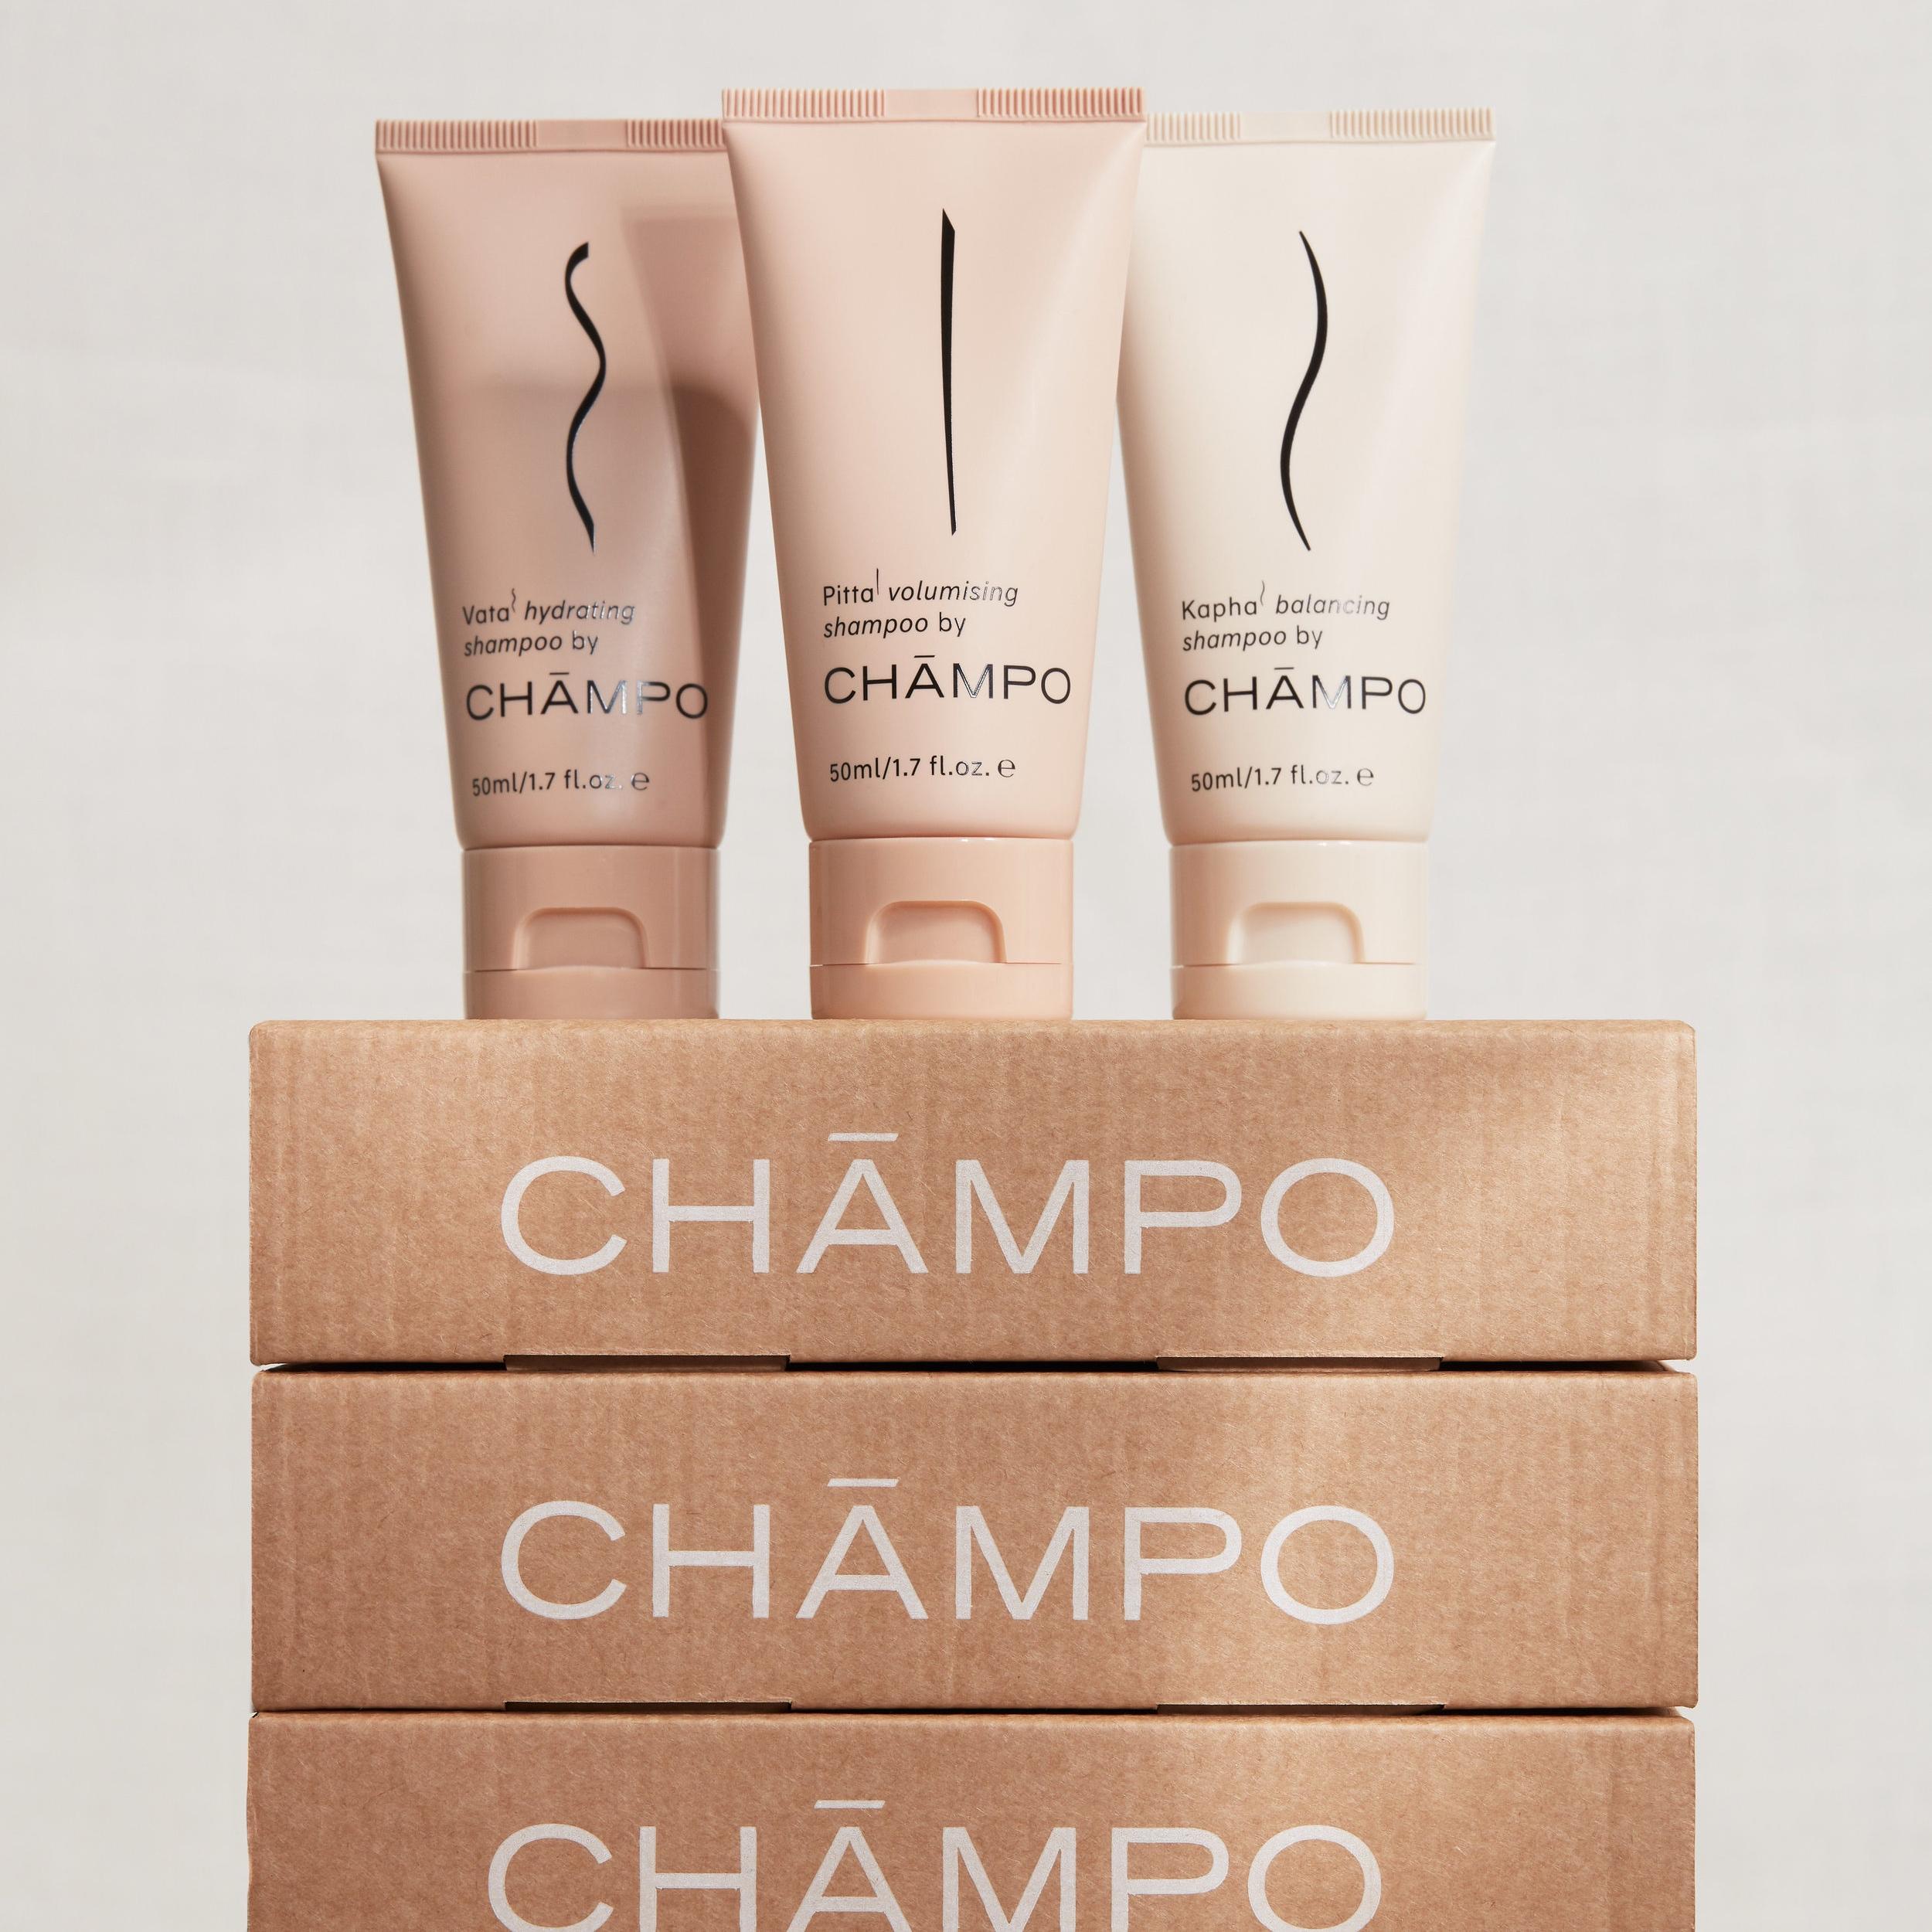 CHAMPO_65.jpg